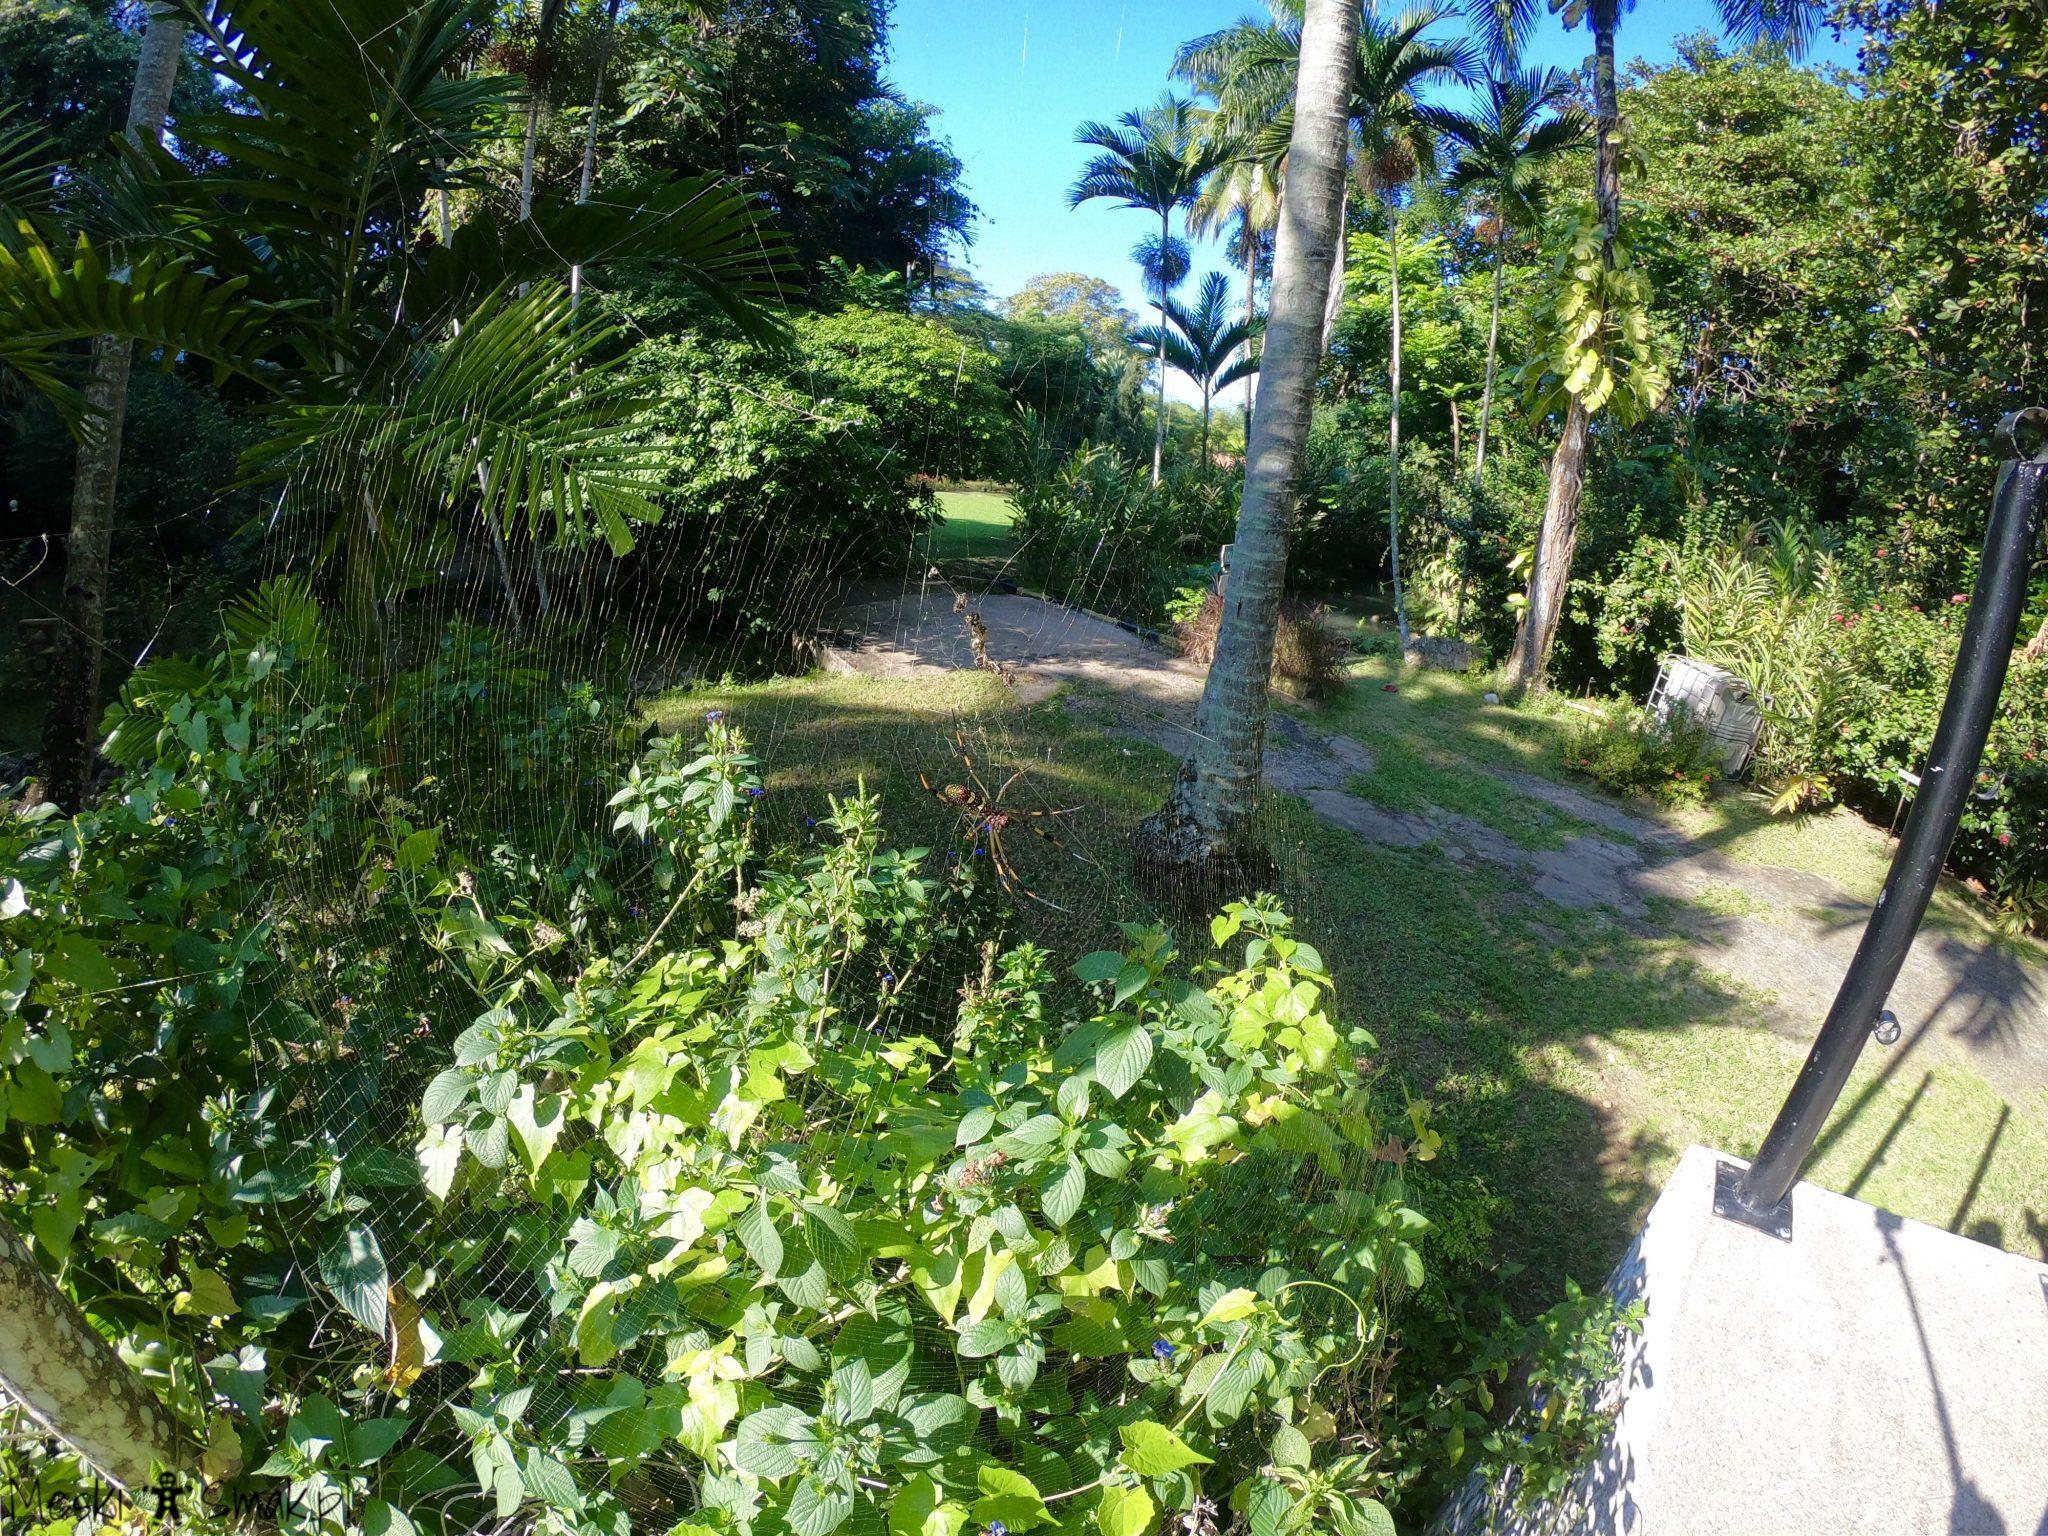 jamaica_The Turtle River Falls & Gardens 6